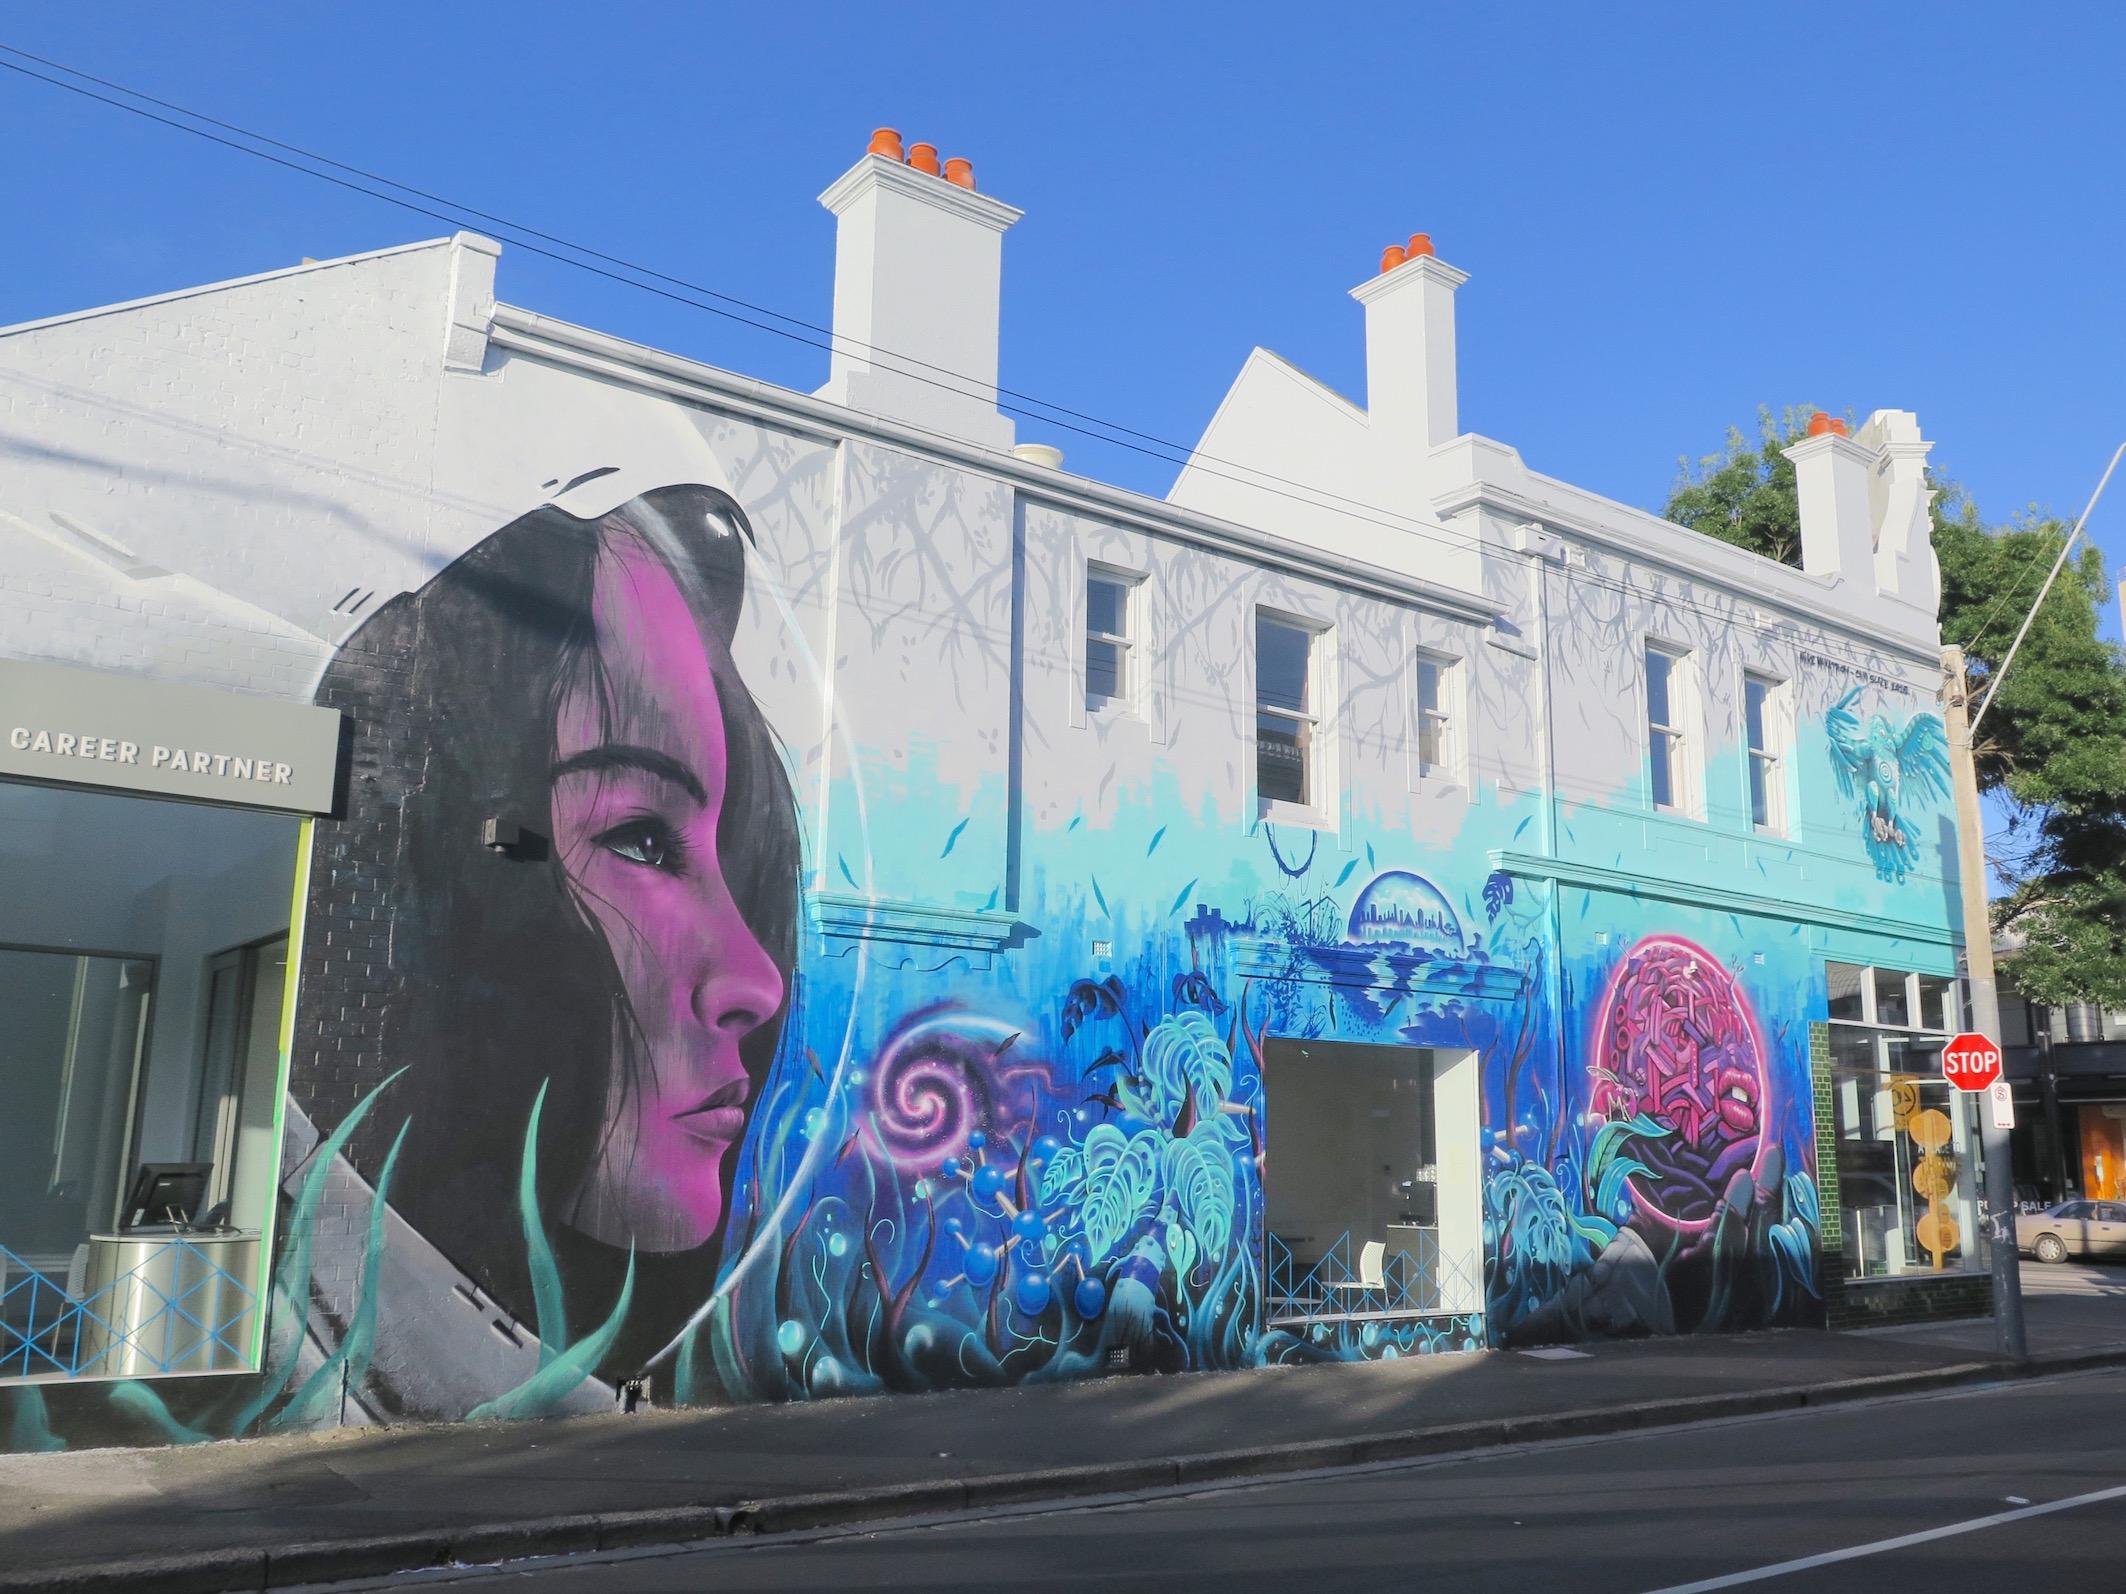 deansunshine_landofsunshine_melbourne_streetart_graffiti_melb-polytechnic-makatron-cam_scale-1